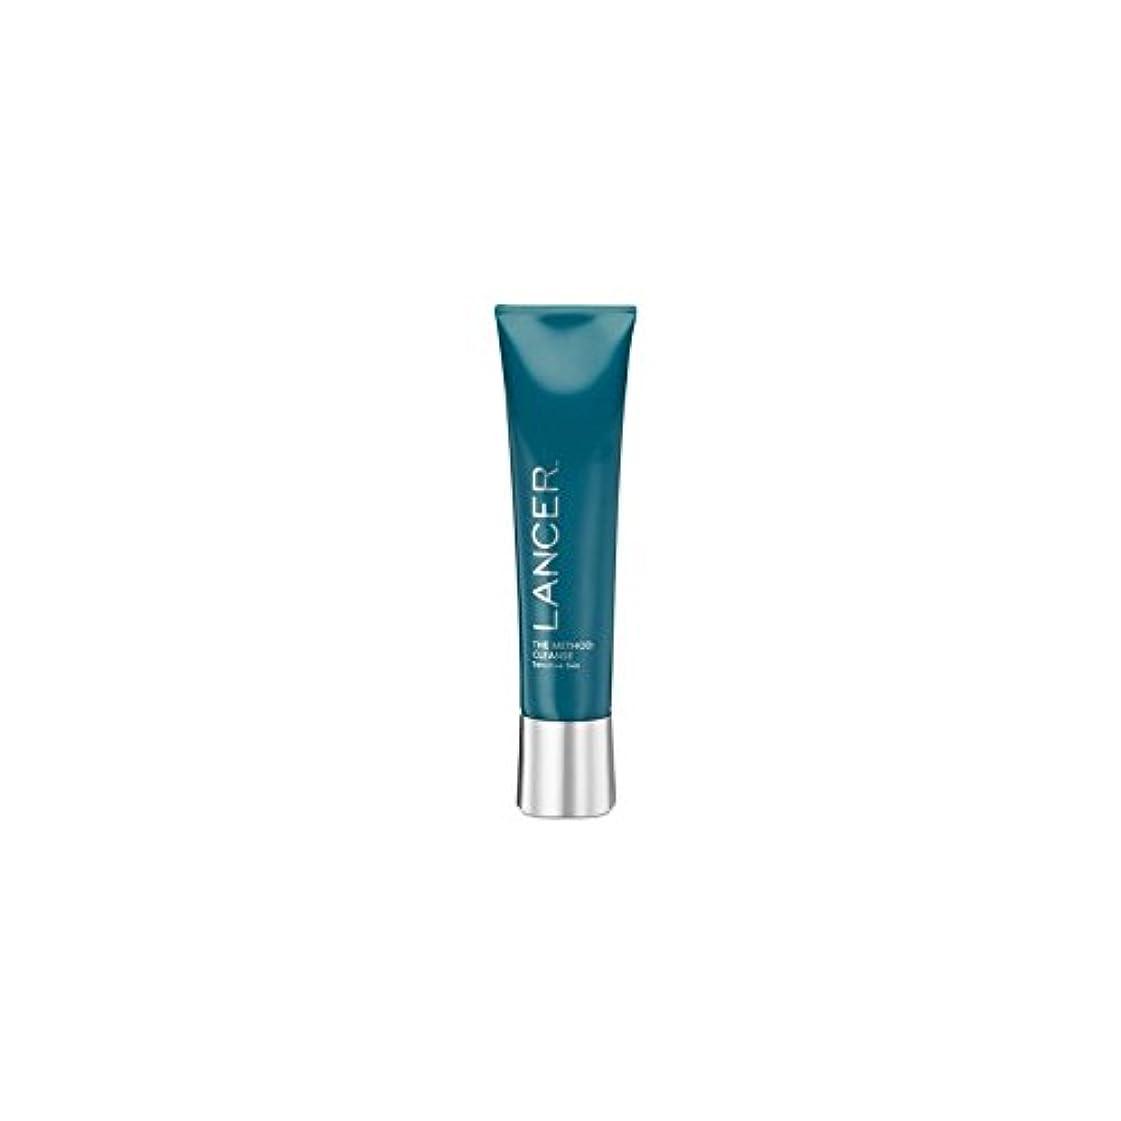 Lancer Skincare The Method: Cleanser Sensitive Skin (120ml) (Pack of 6) - クレンザー敏感肌(120ミリリットル):ランサーは、メソッドをスキンケア...